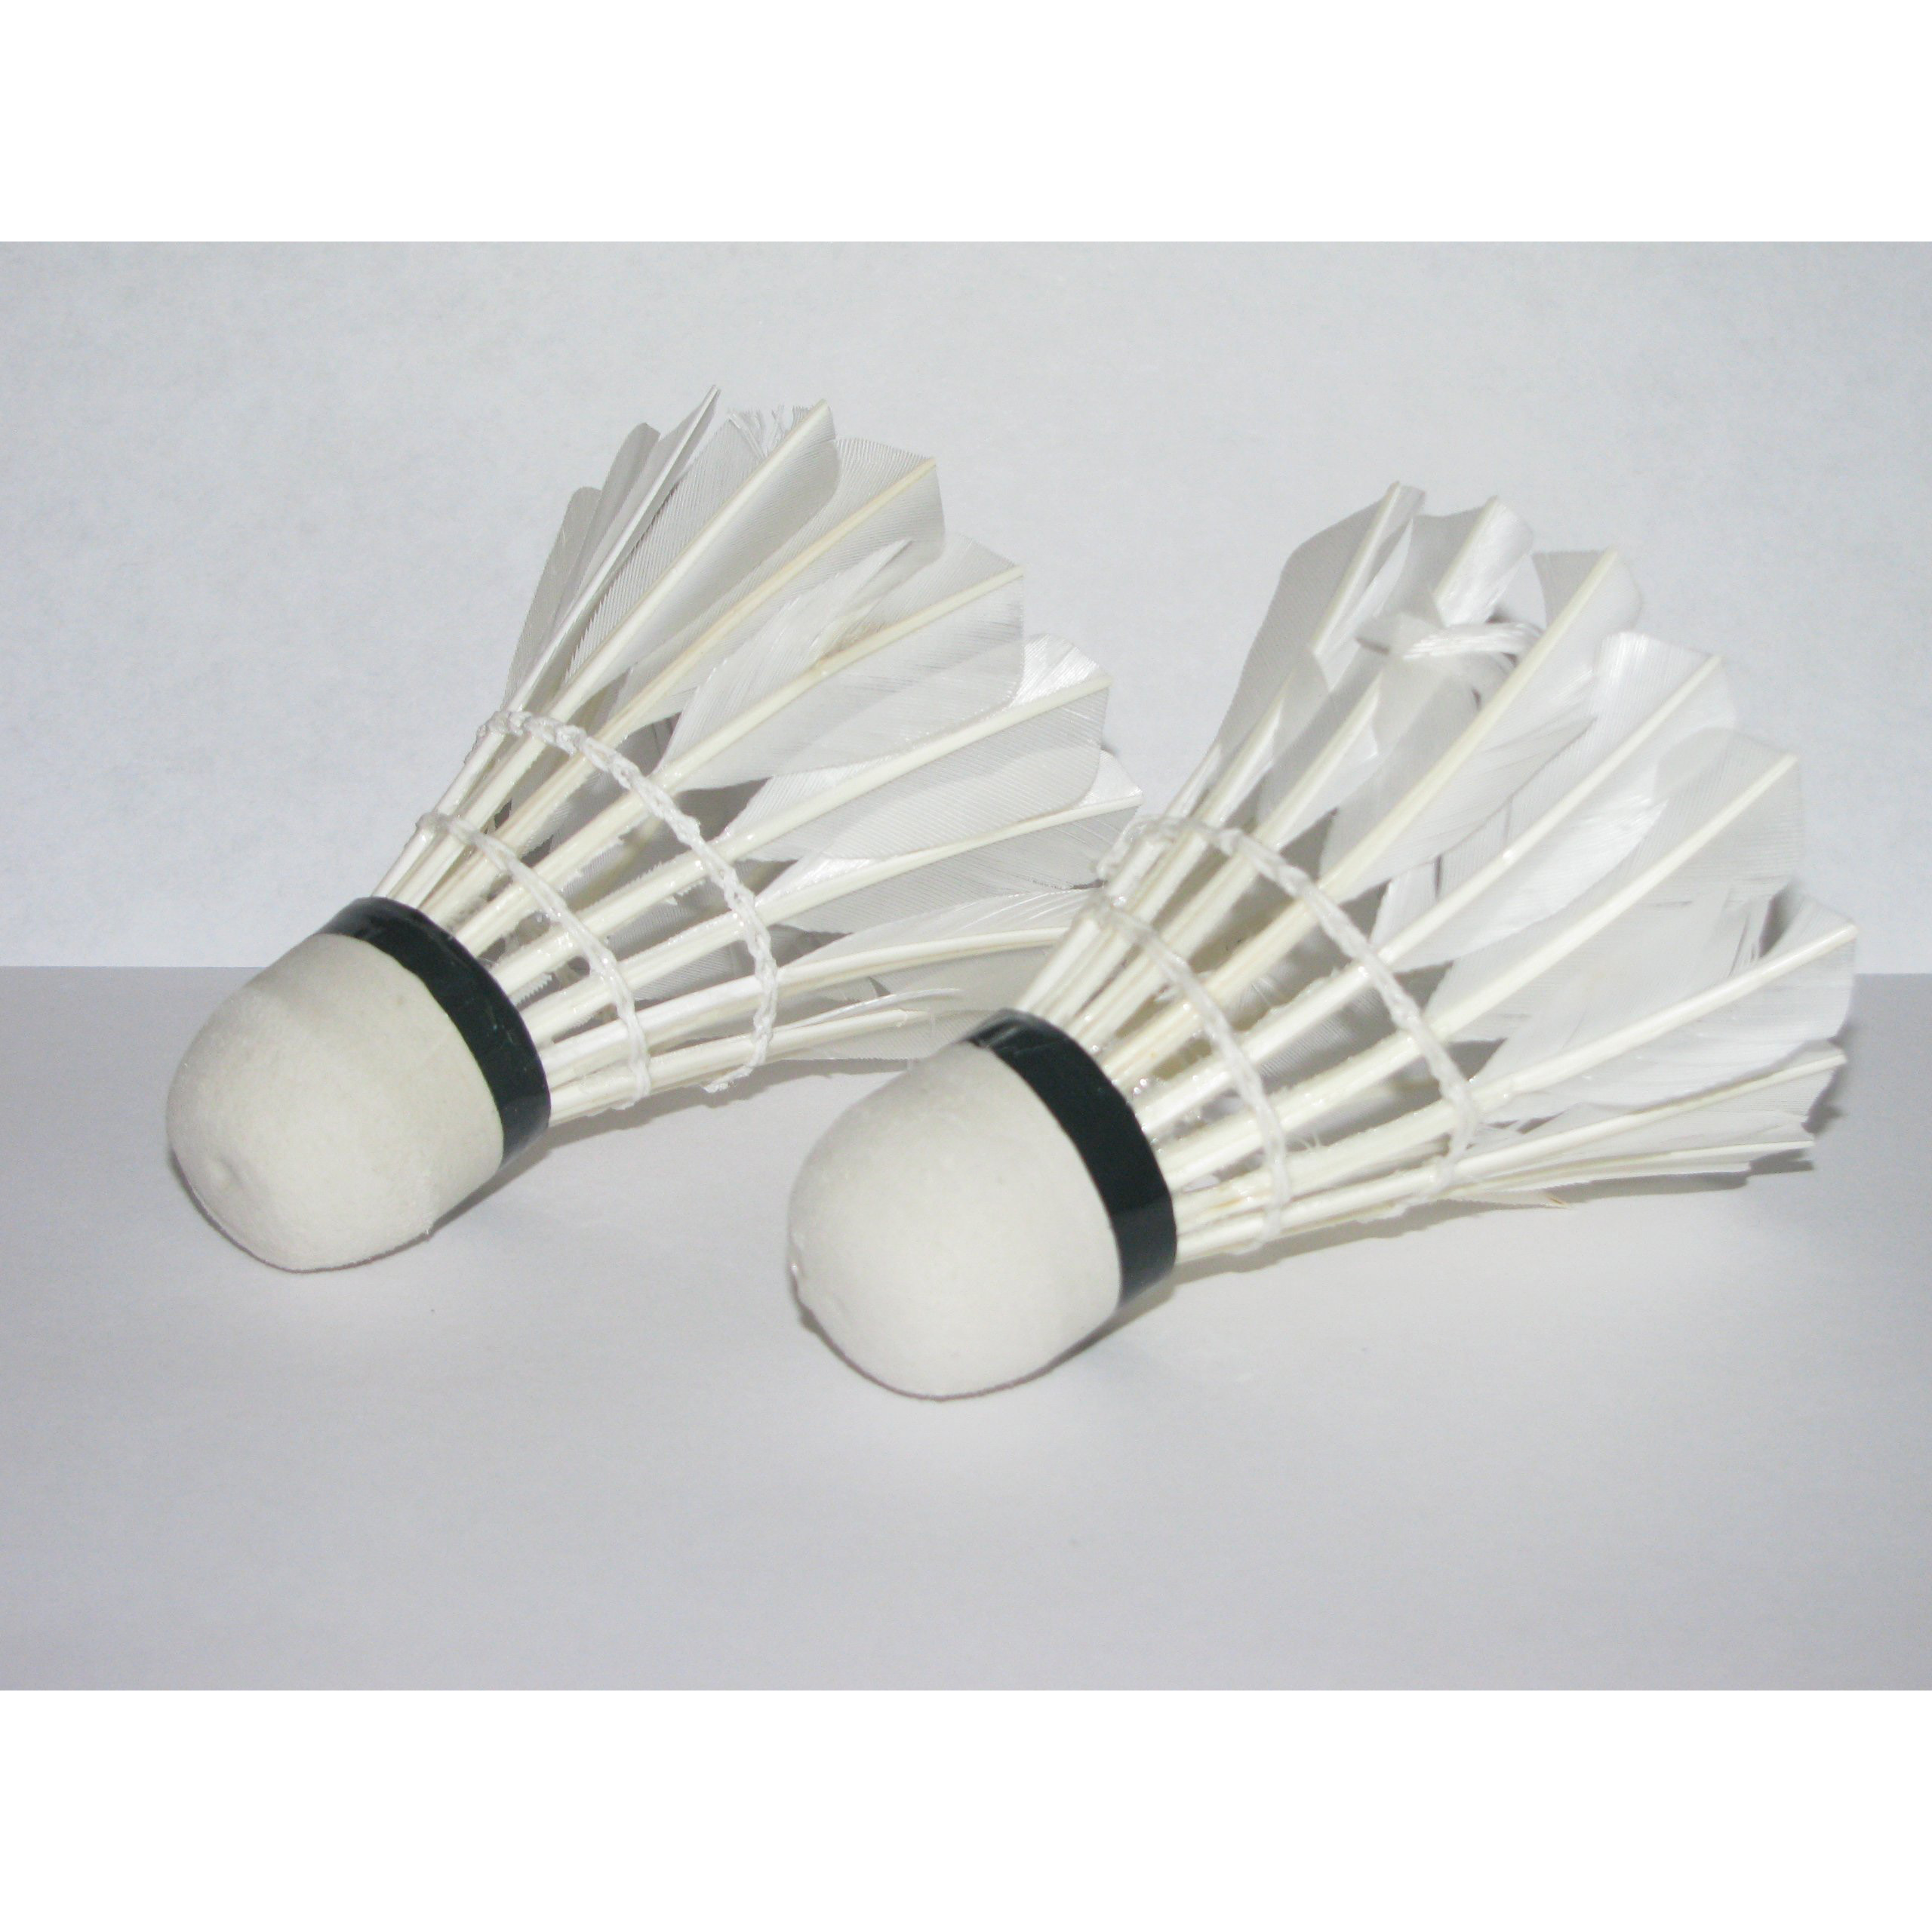 LGFM-New LED Light-Up Badminton Birdies (Set of 2) Shuttlecocks Shuttlecock Feather